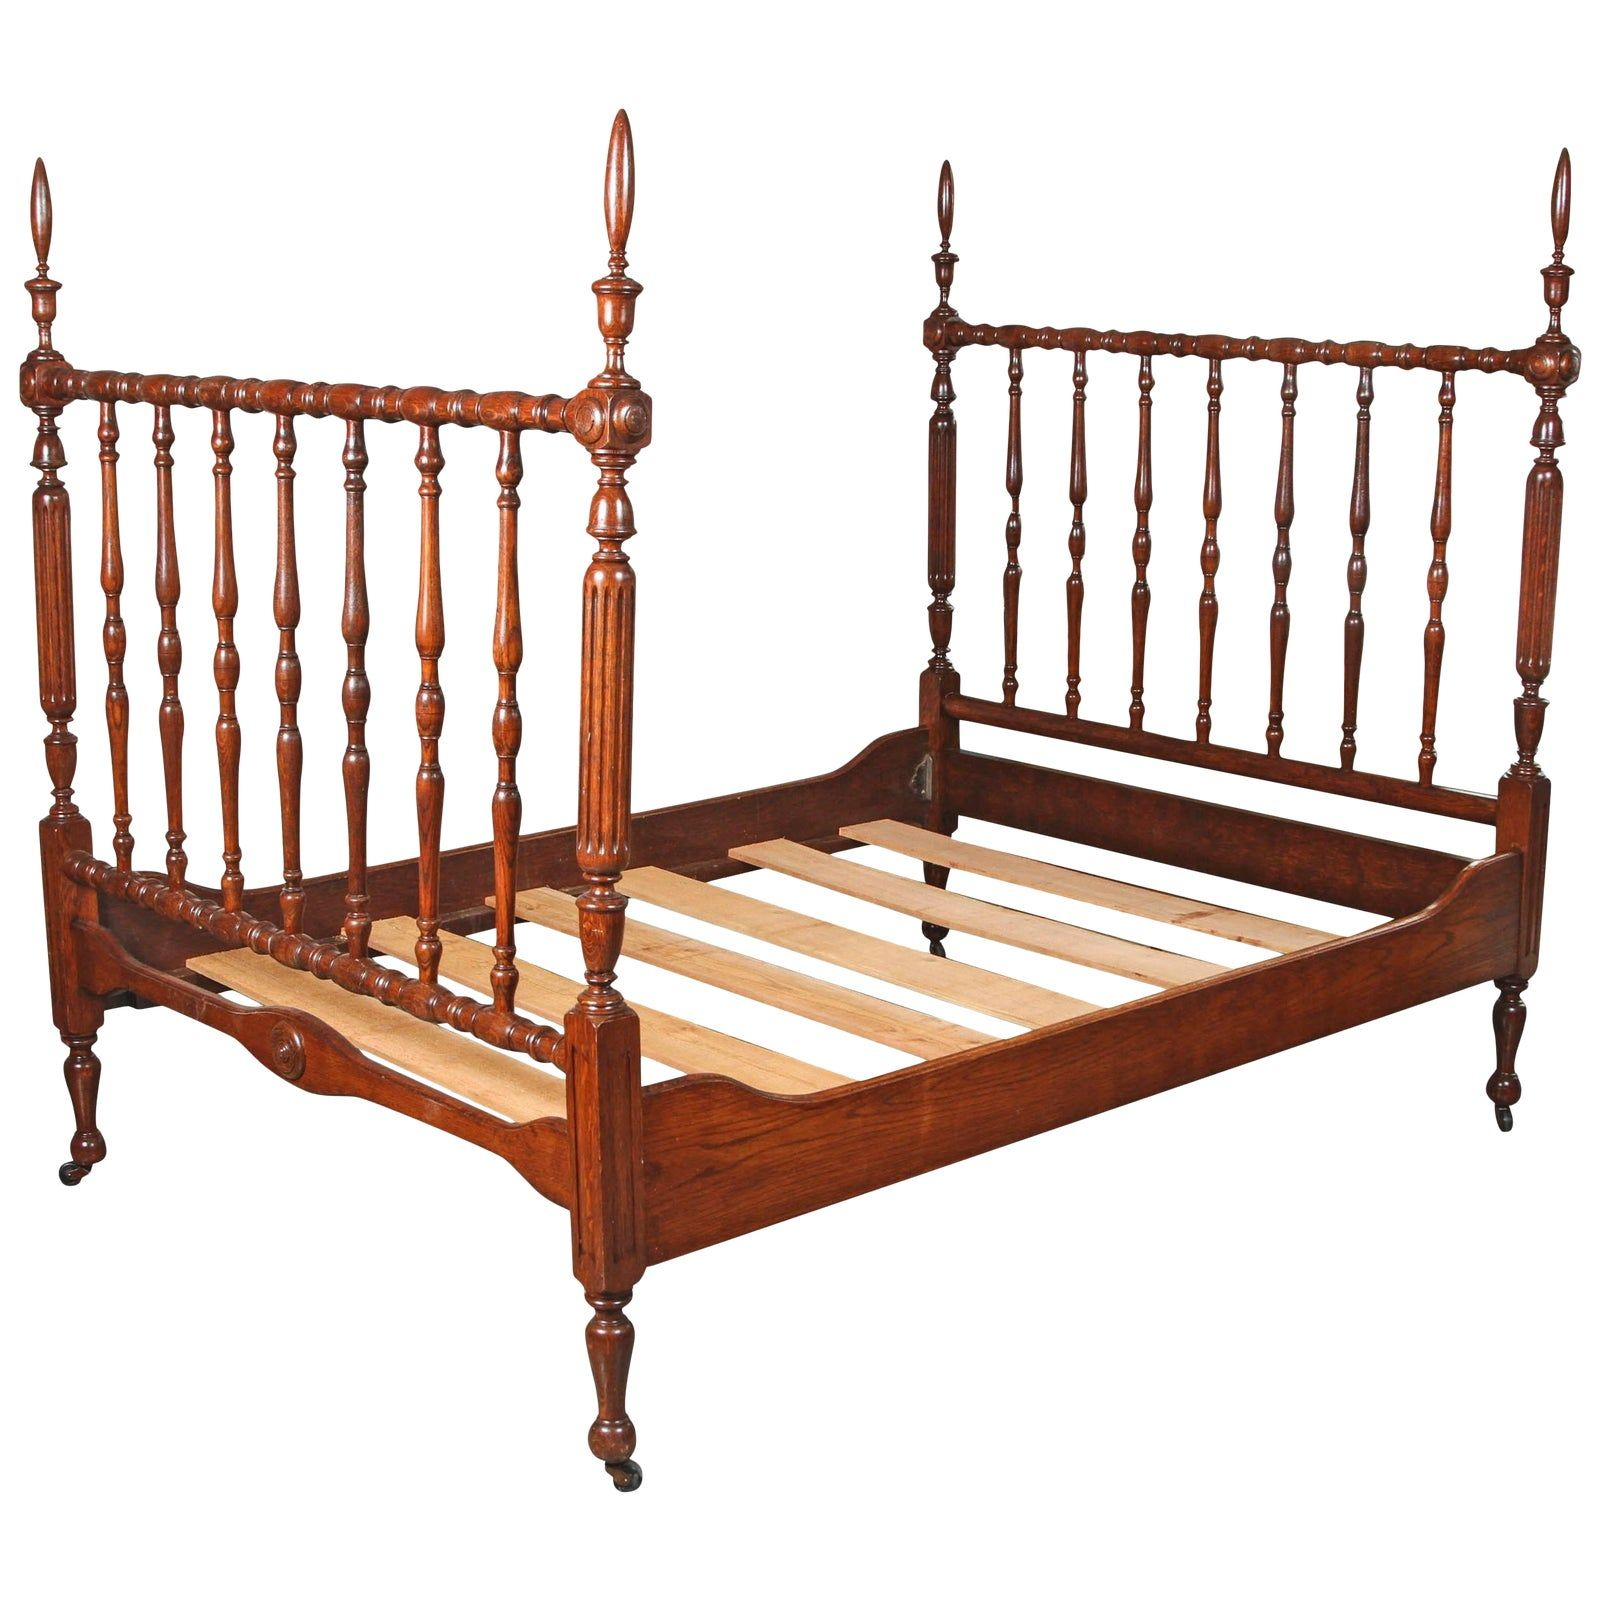 1930s Walnut Spindle Full Sized Bed Frame, Newly Polished